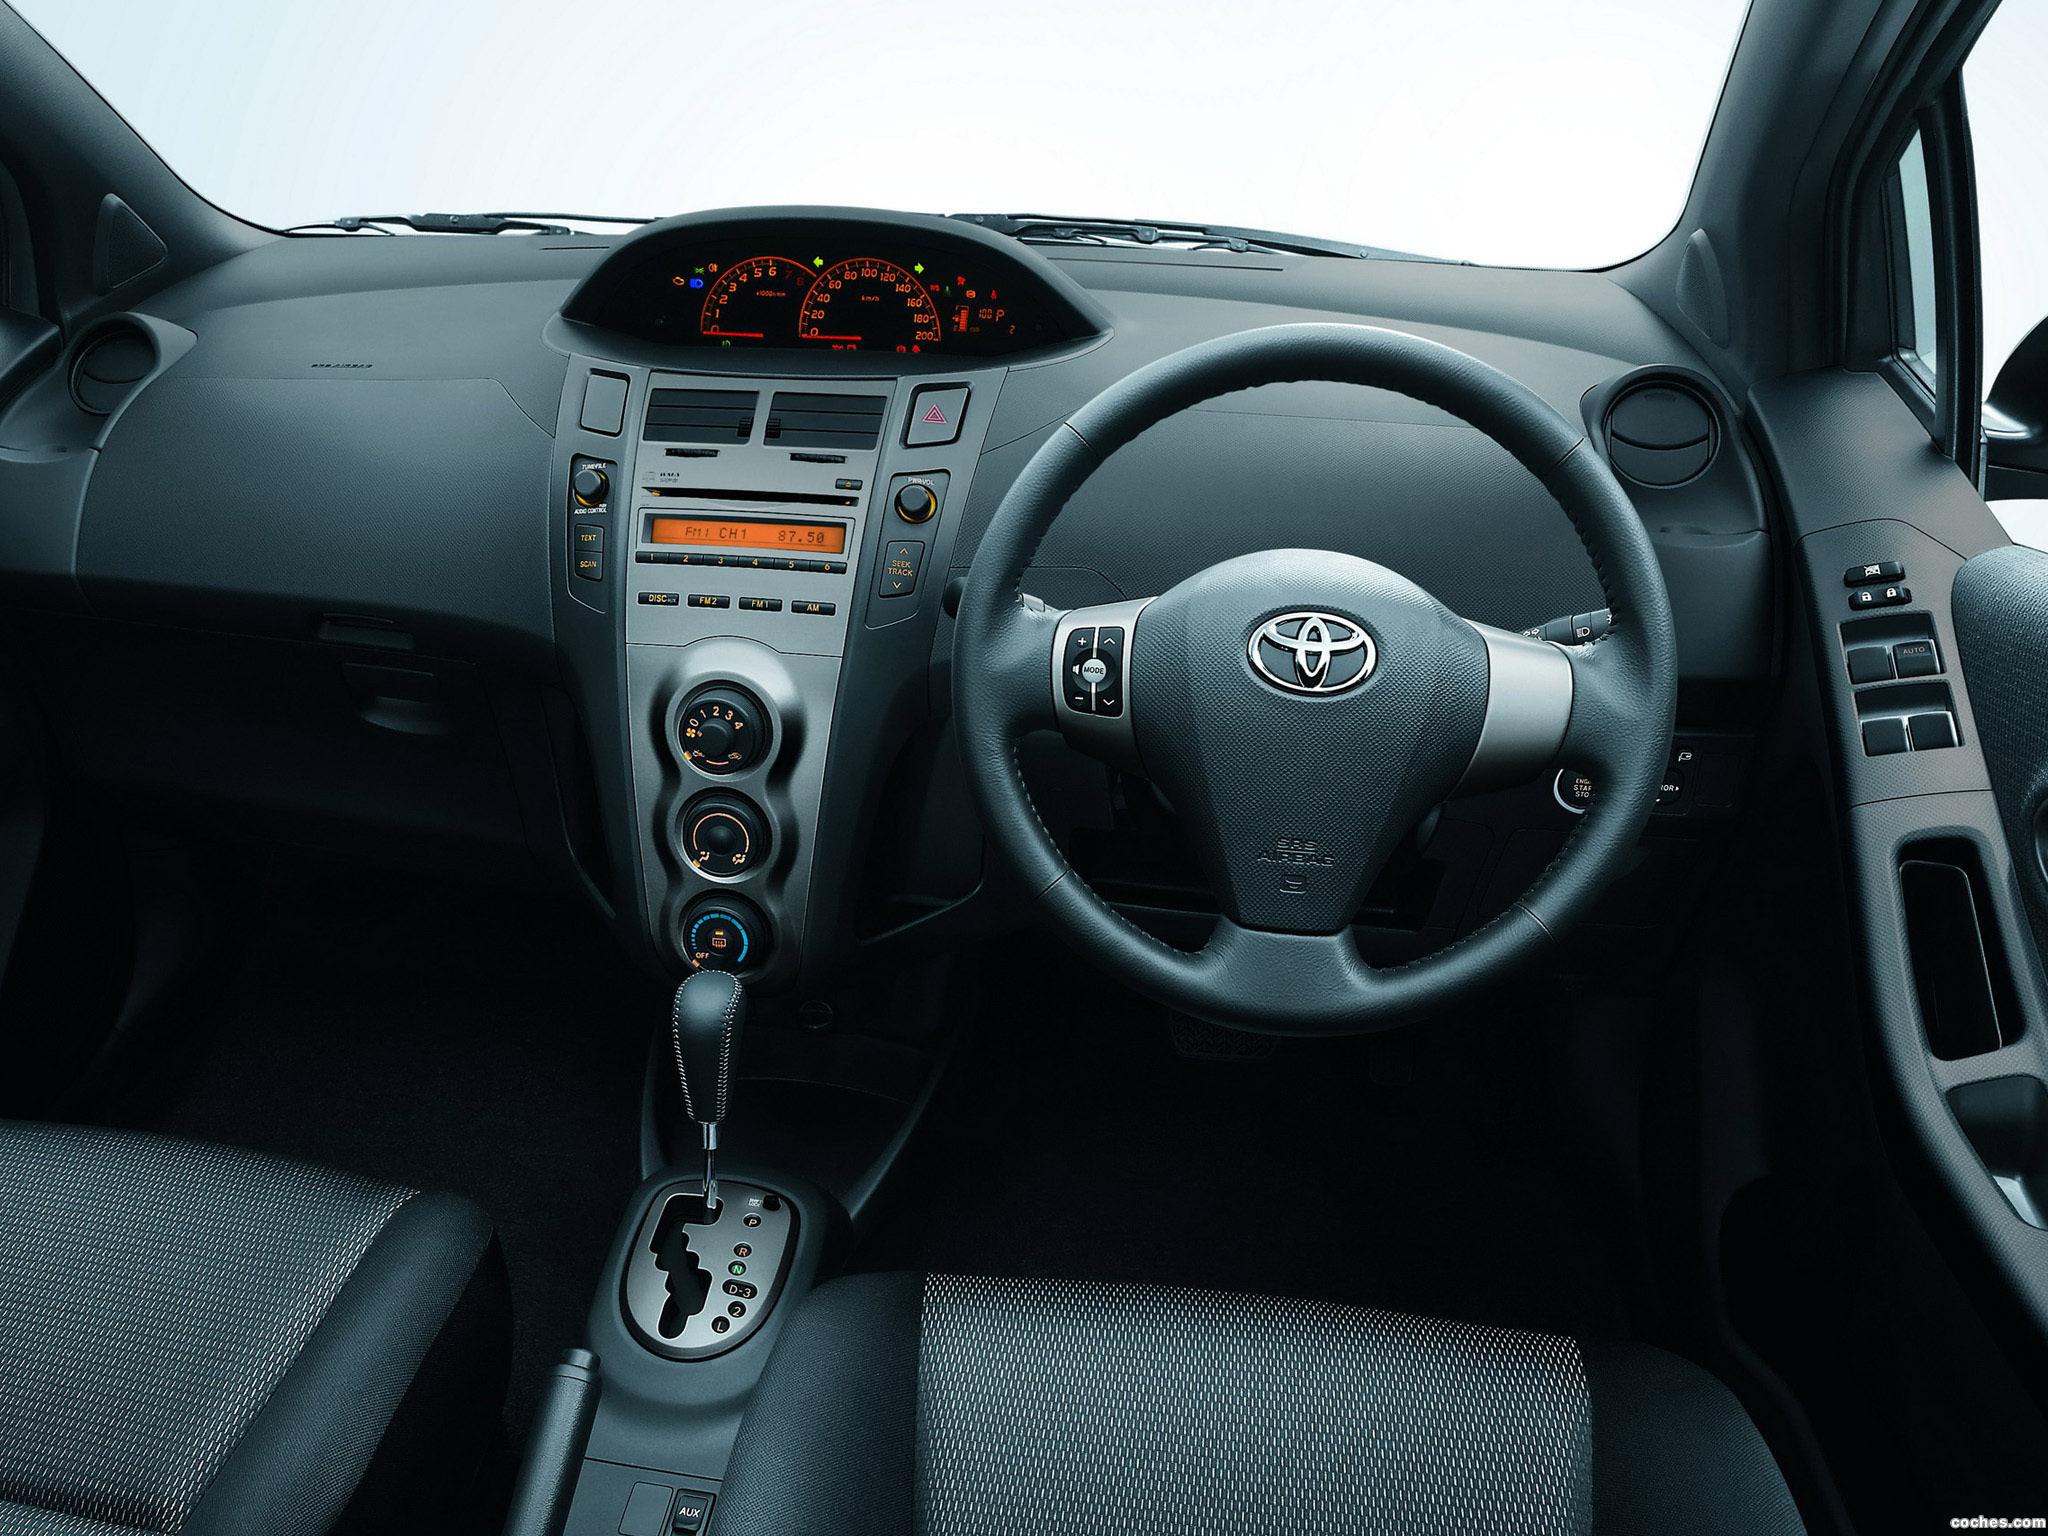 Foto 5 de Toyota Yaris S Limited Thailand 2009